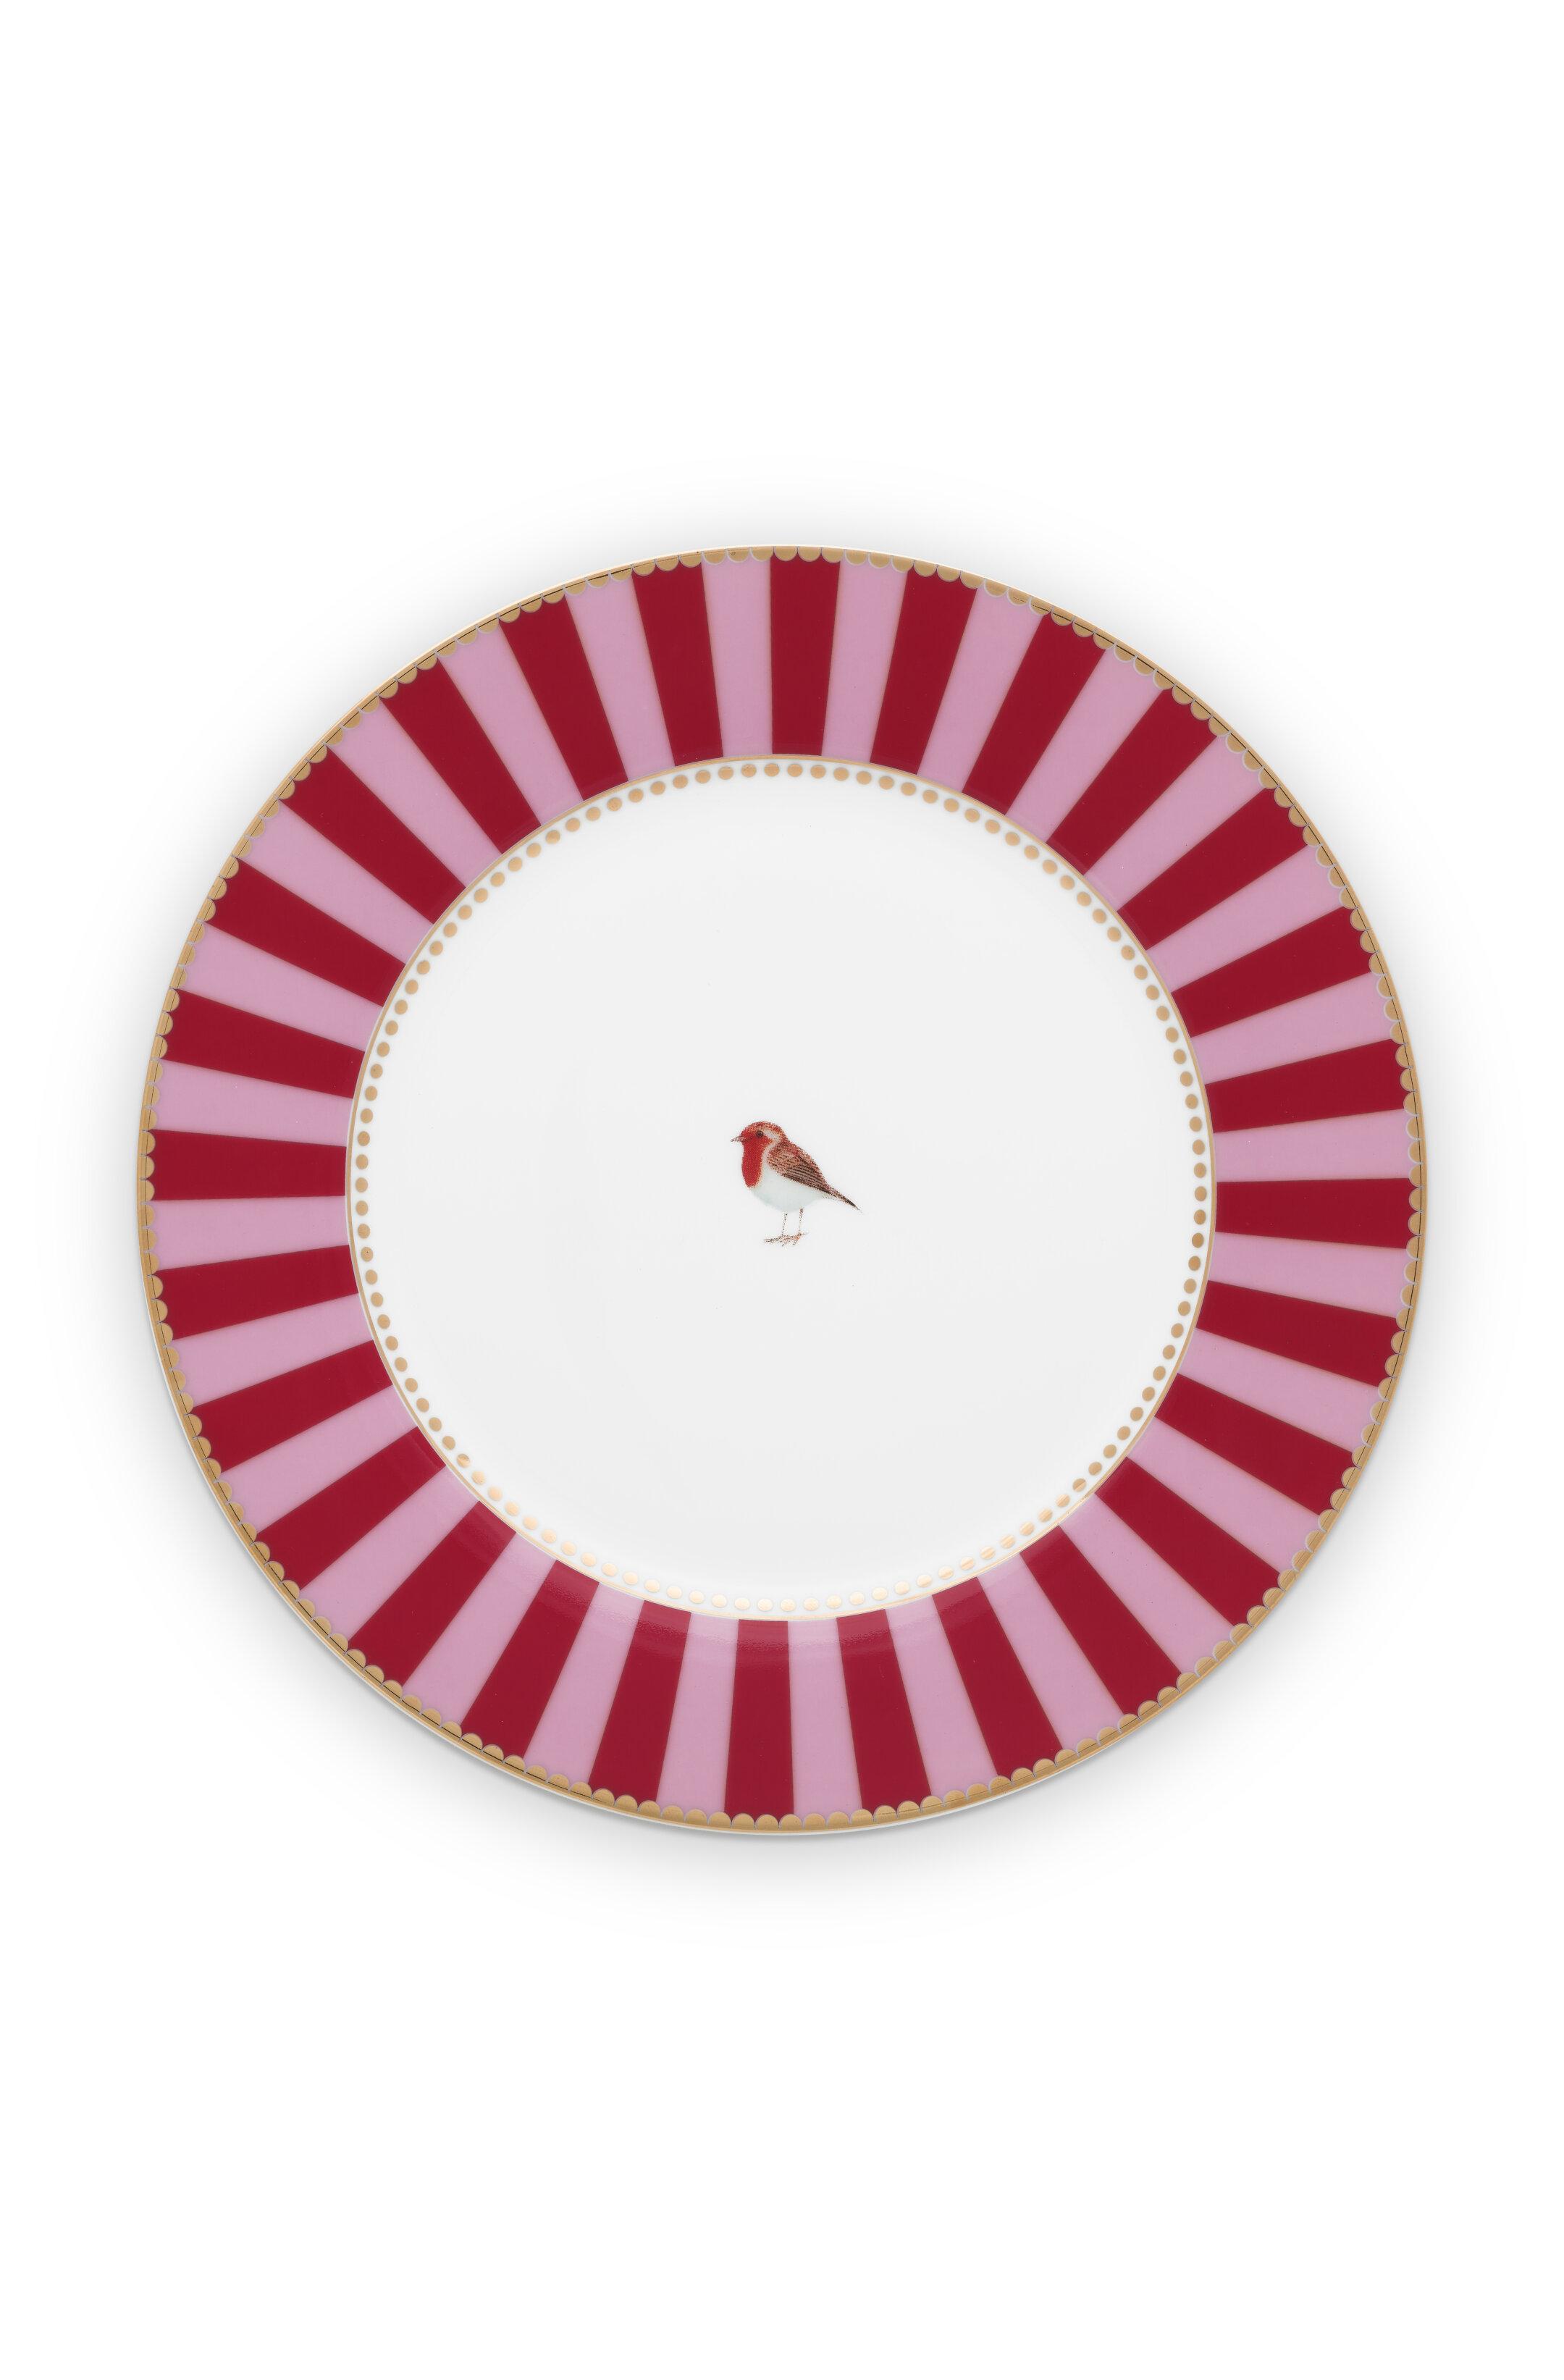 Pip Studio Love Birds Teller Stripes Red-Pink (21cm)